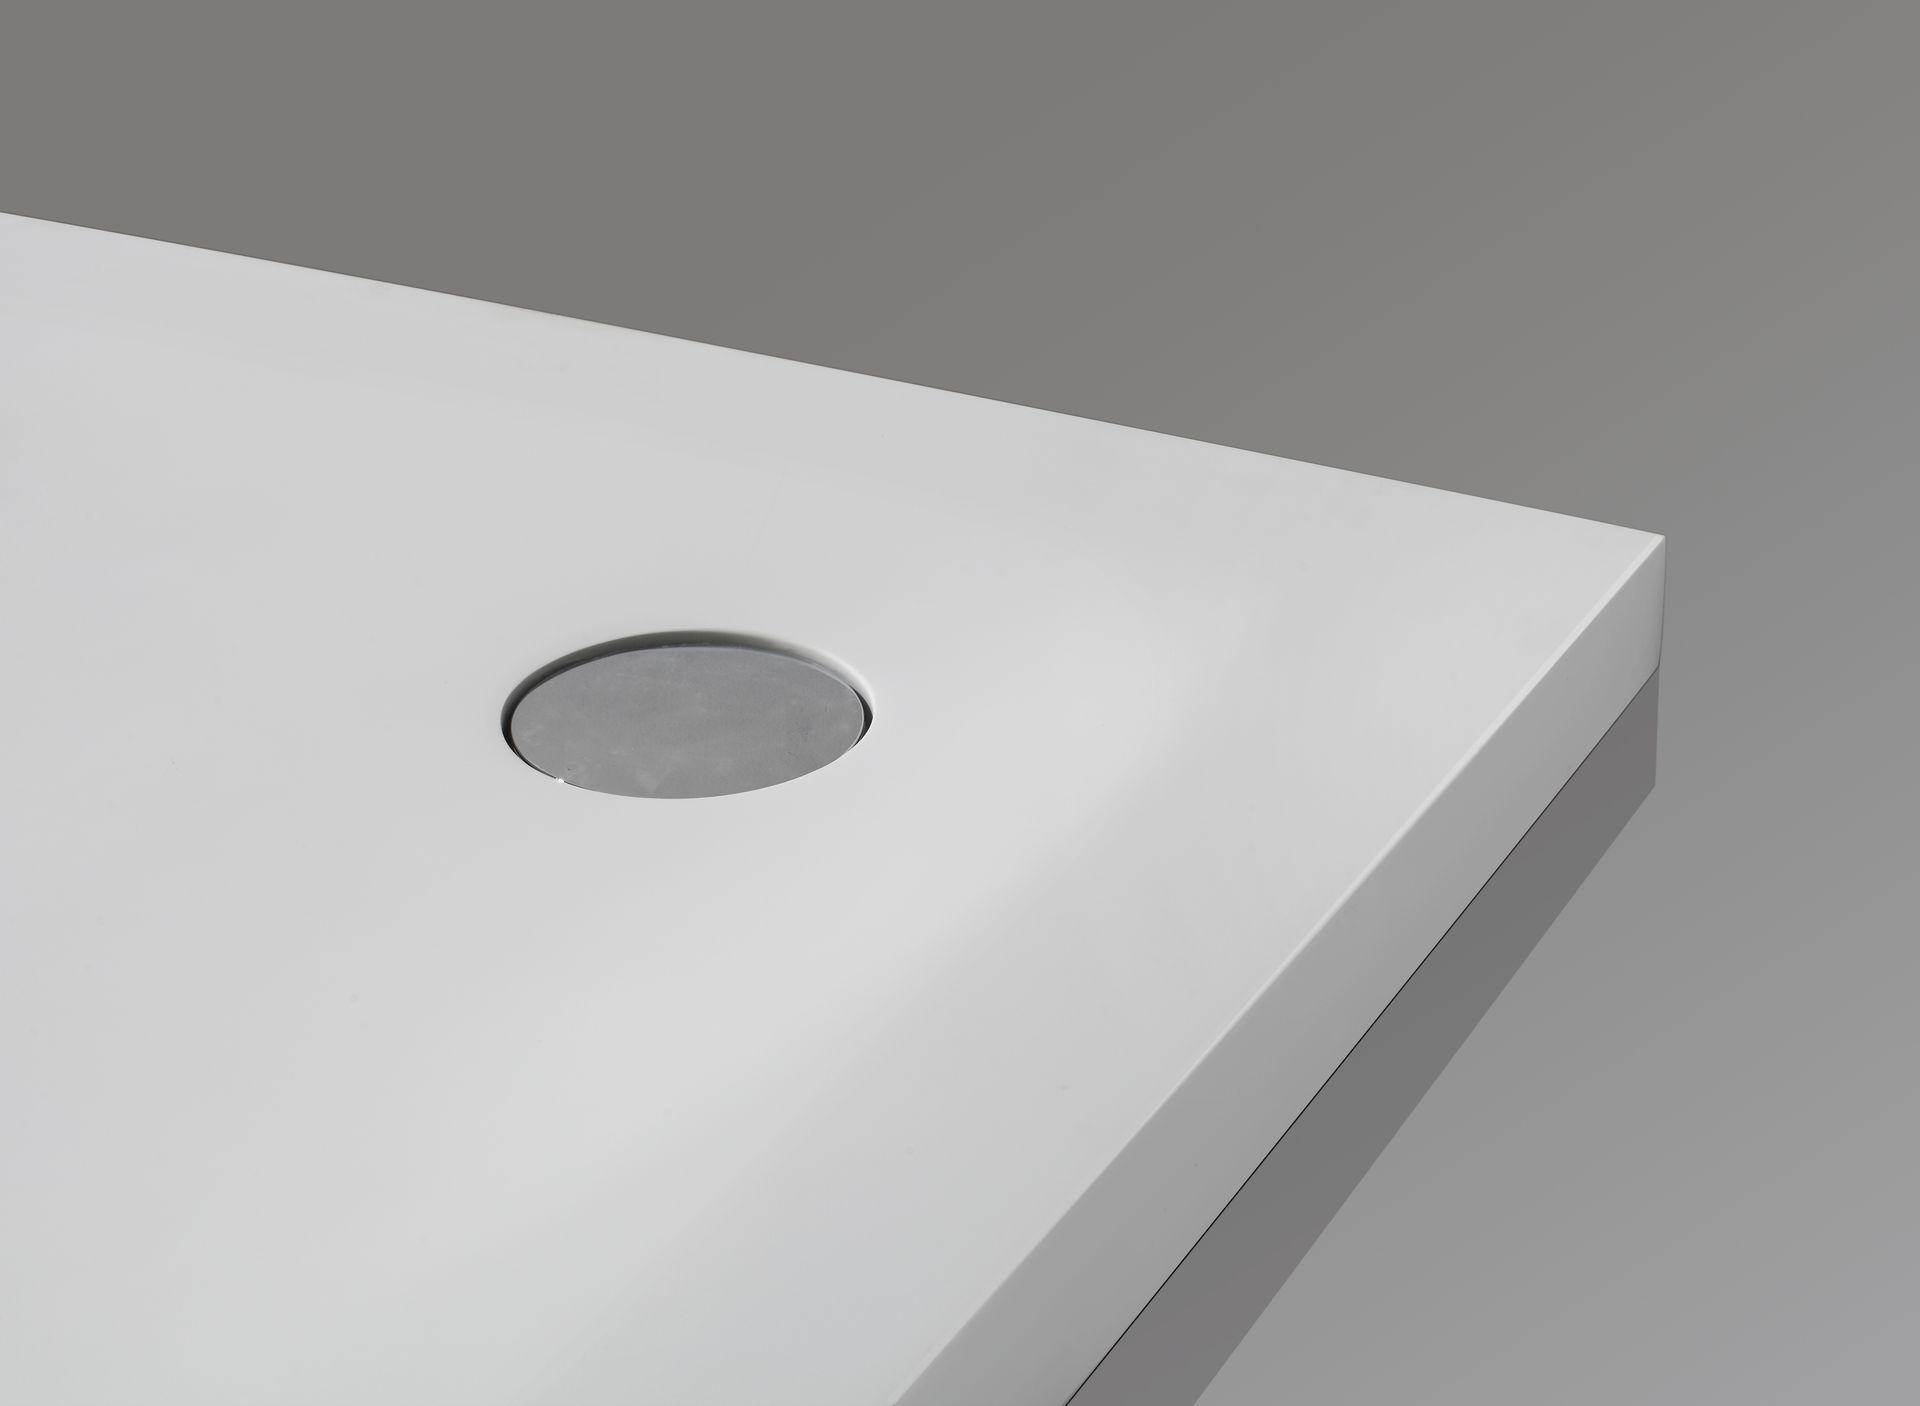 mineralguss duschtasse 90 x 90 x 5 cm glasdeals. Black Bedroom Furniture Sets. Home Design Ideas